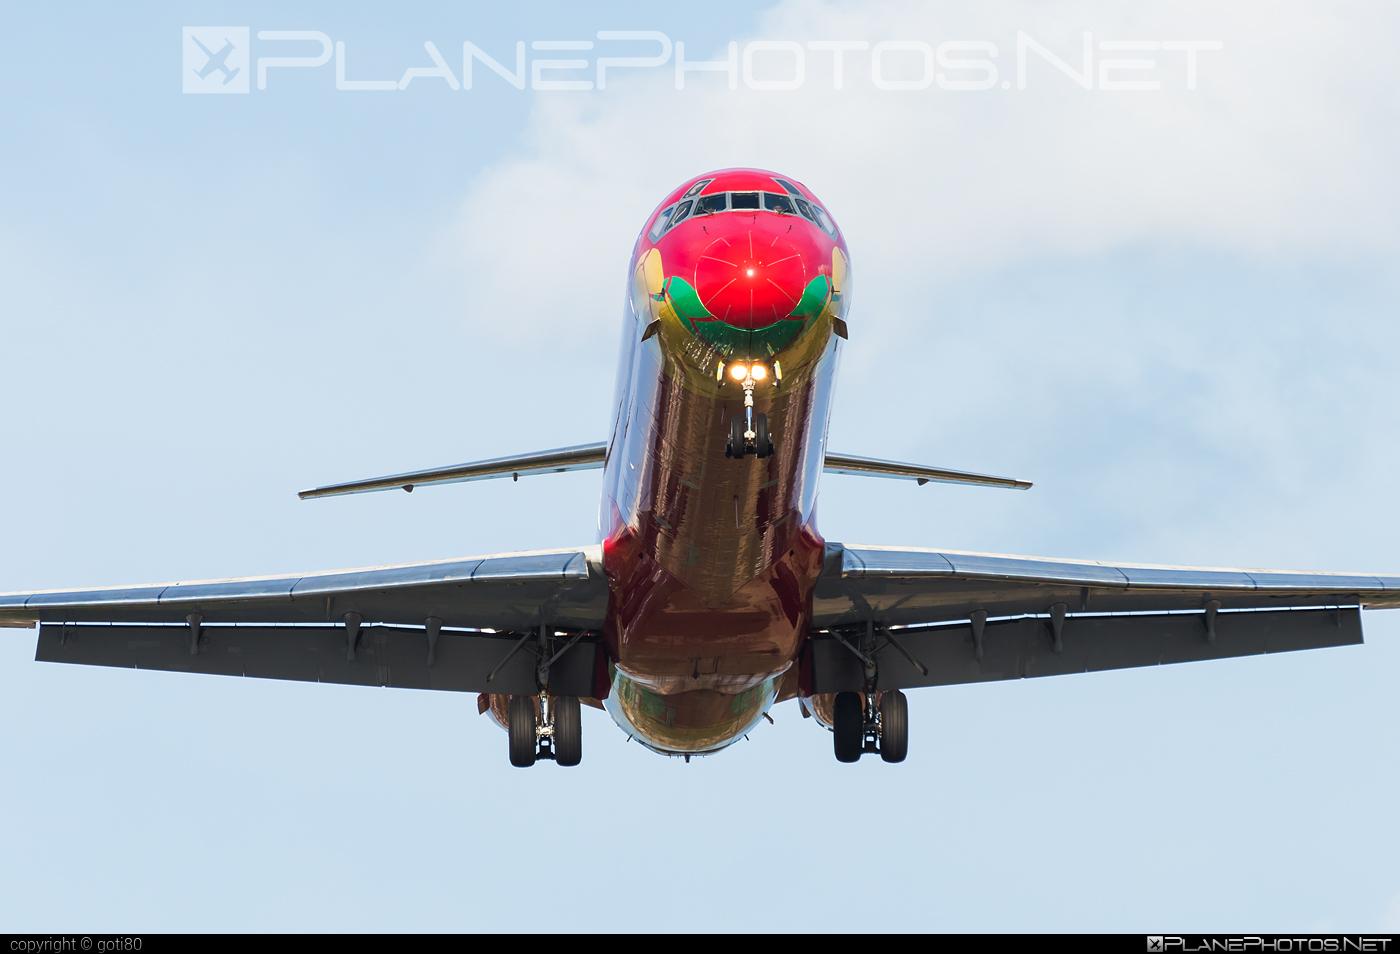 Danish Air Transport (DAT) McDonnell Douglas MD-83 - OY-RUE #mcdonnelldouglas #mcdonnelldouglas80 #mcdonnelldouglas83 #mcdonnelldouglasmd80 #mcdonnelldouglasmd83 #md80 #md83